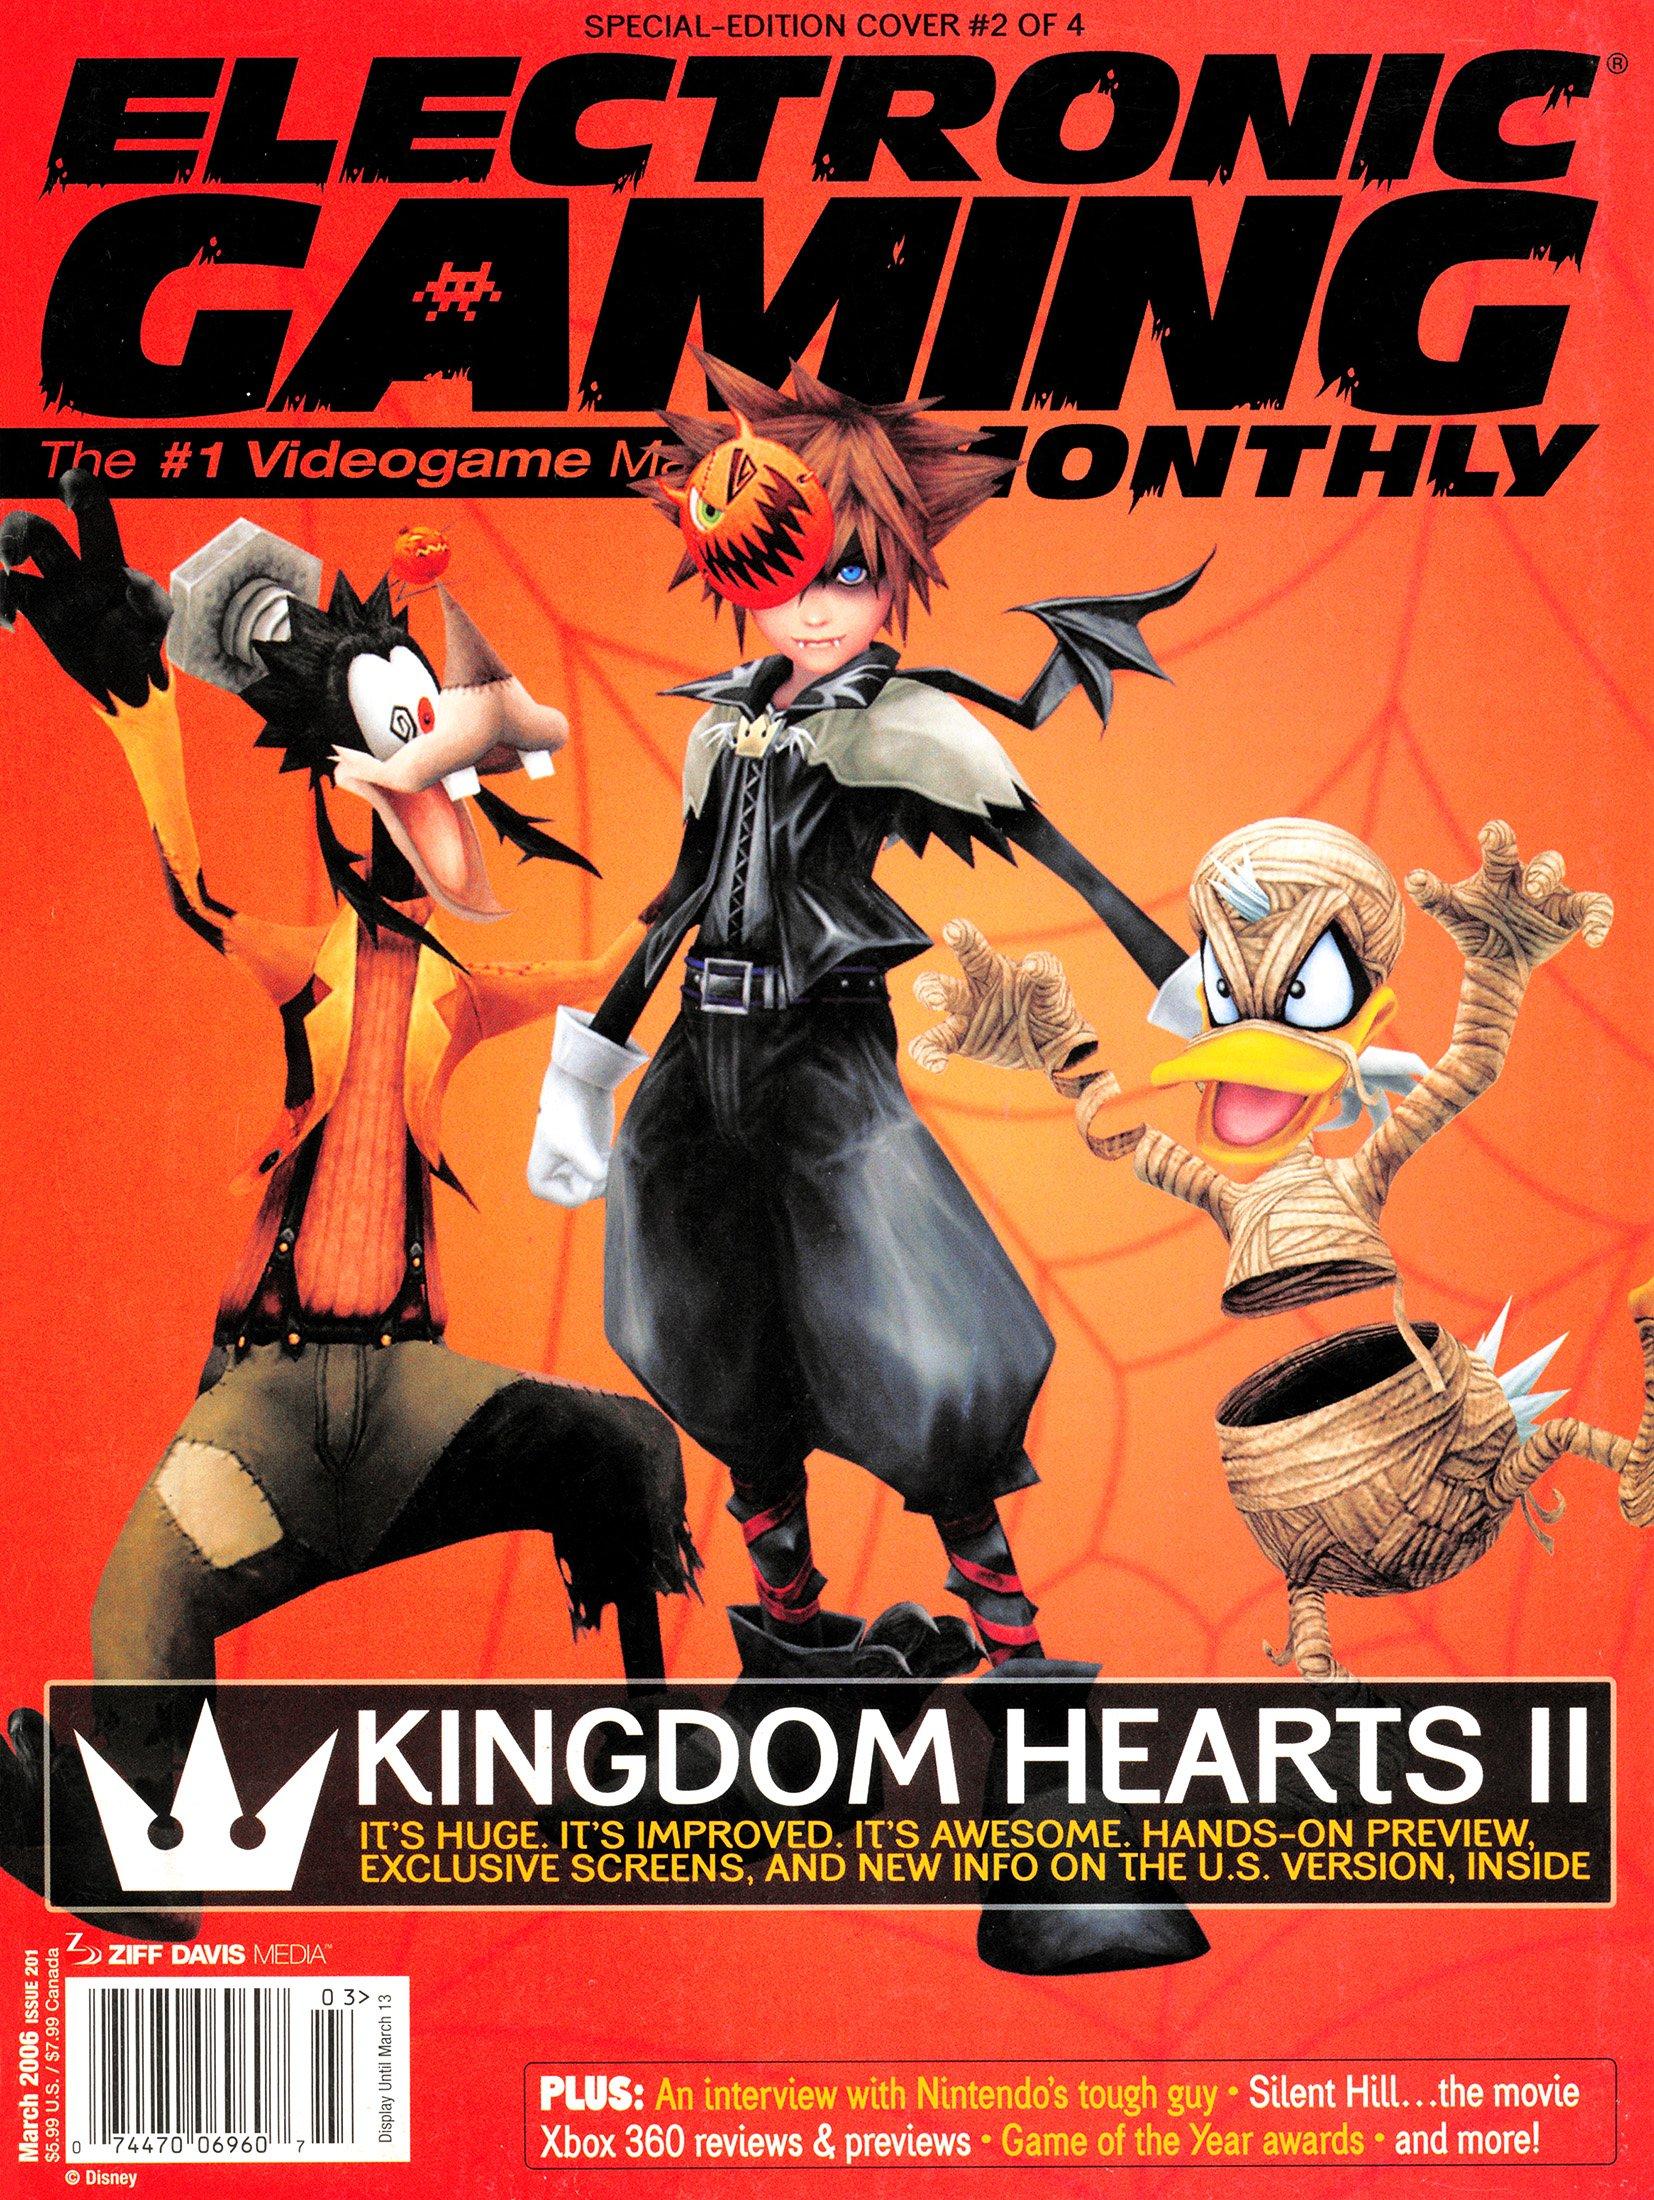 EGM 201 cover 2